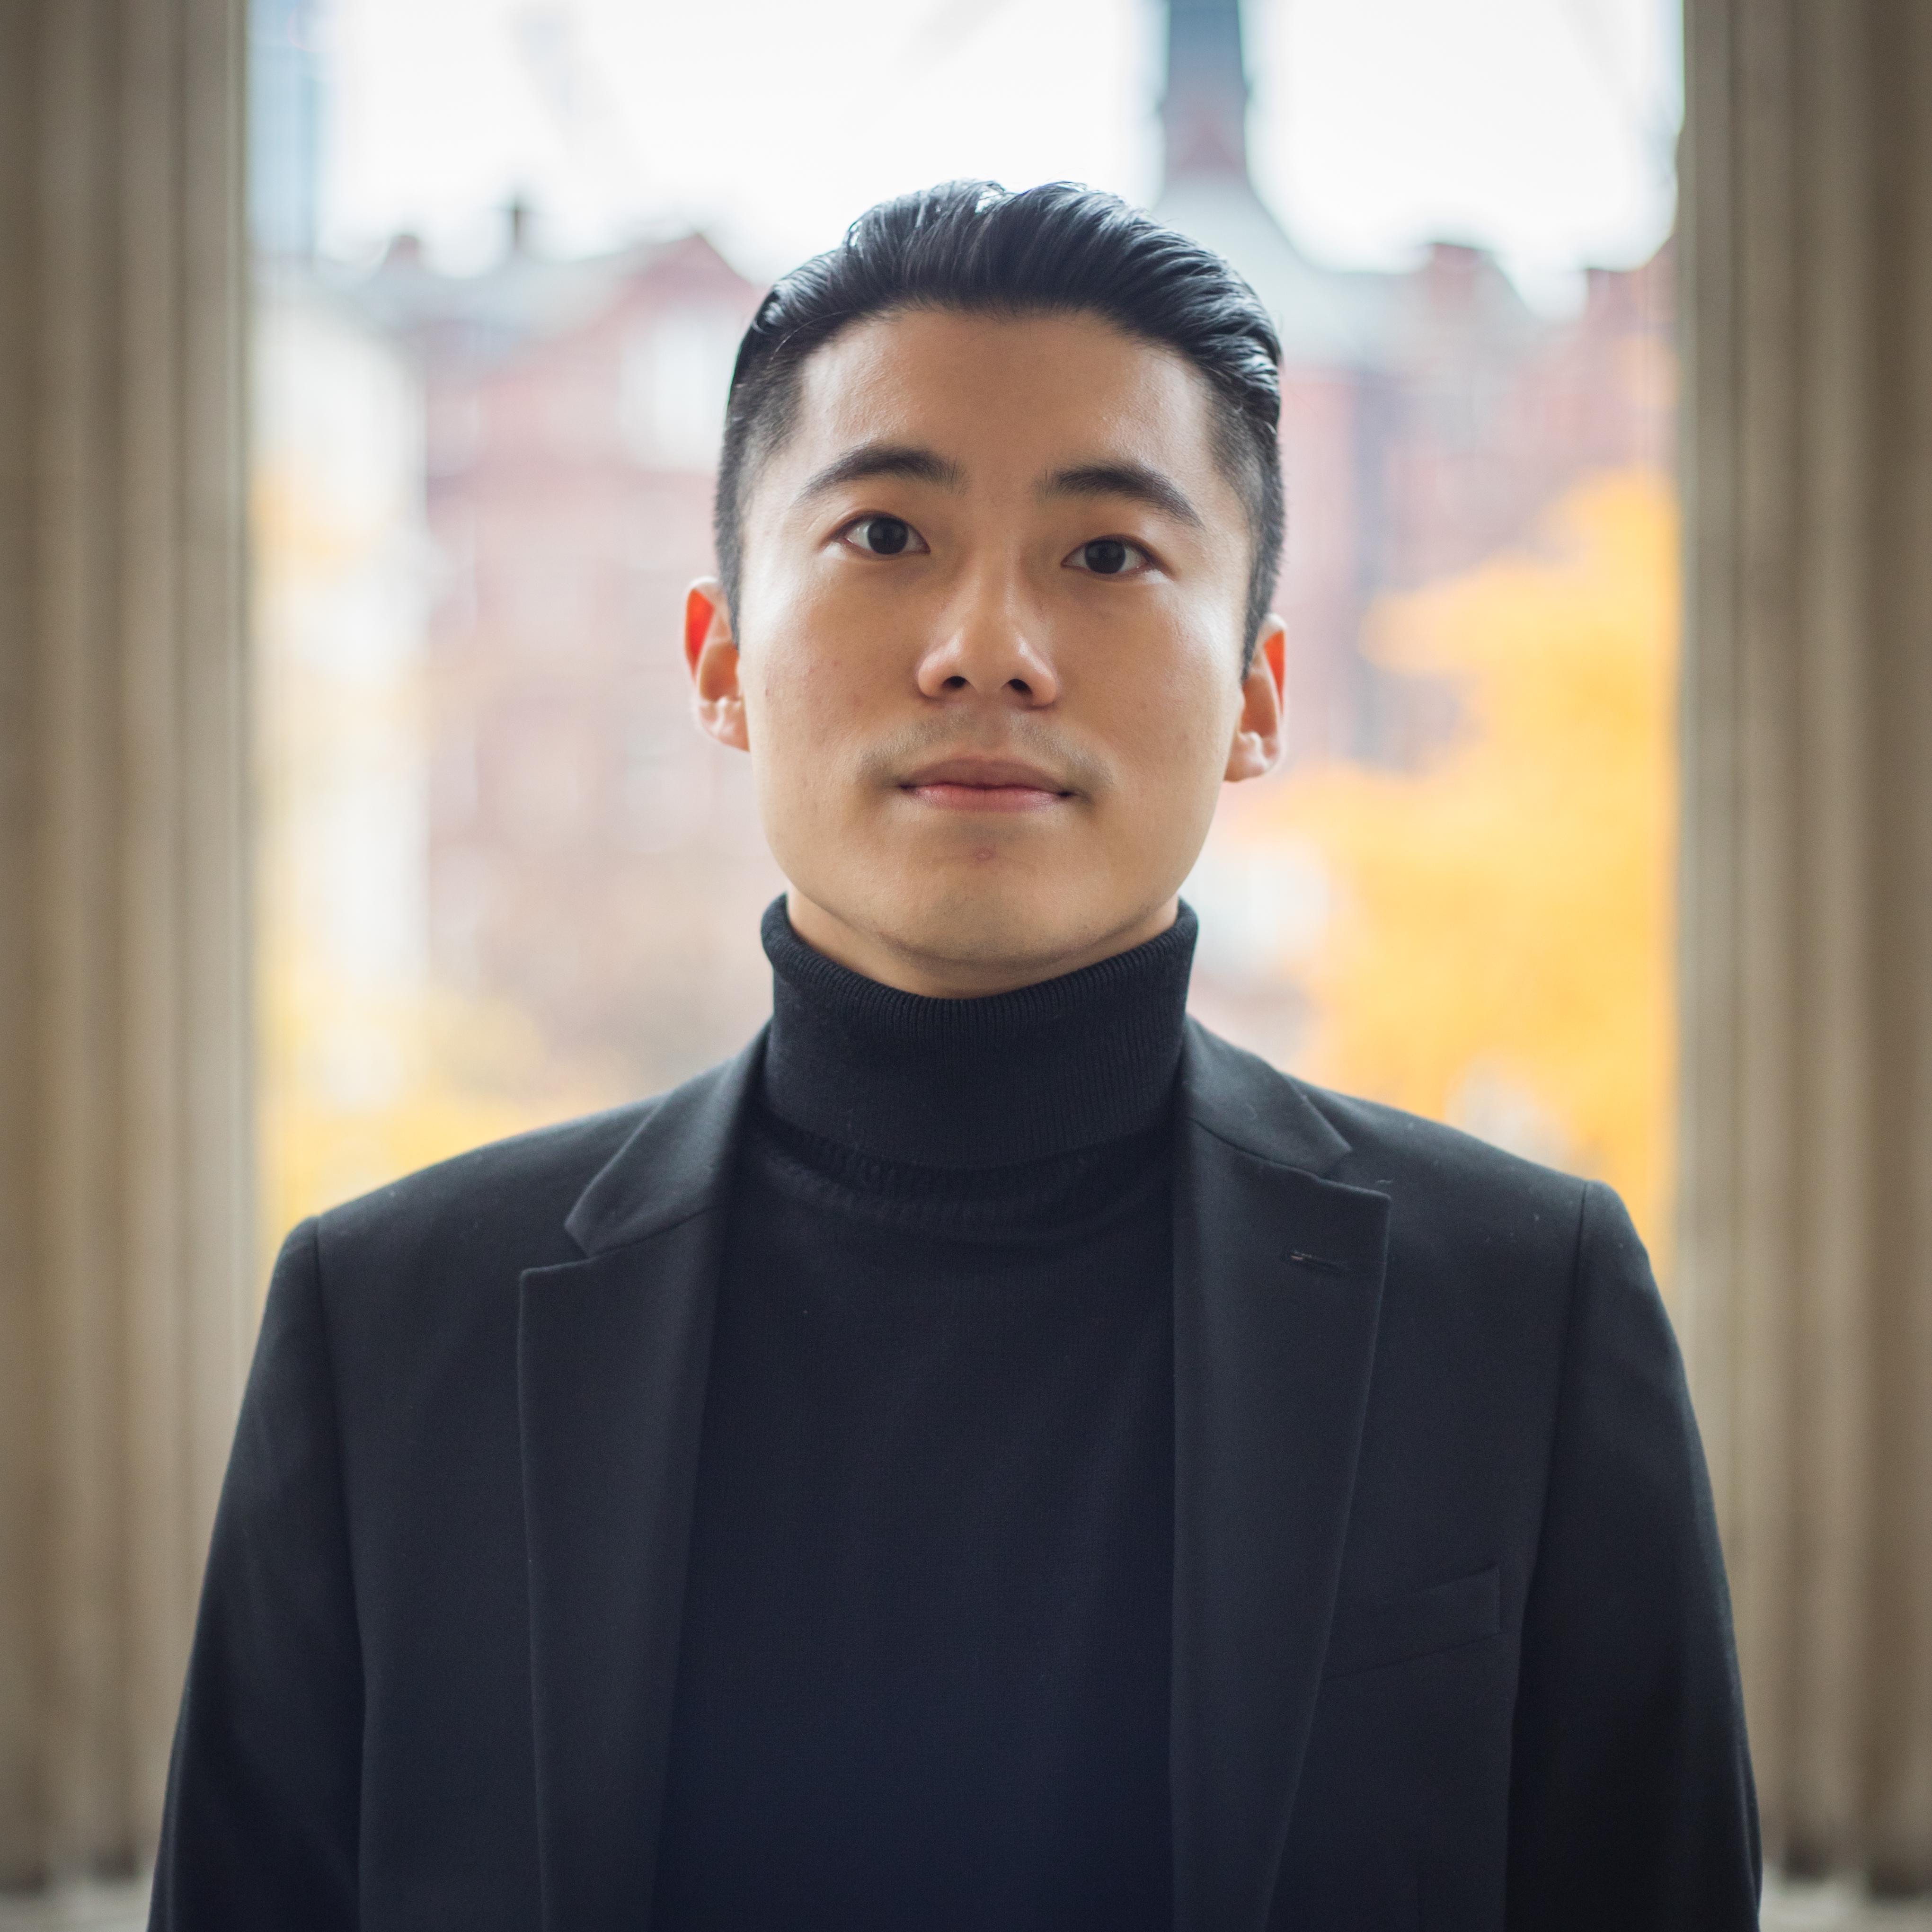 Hajun Lee